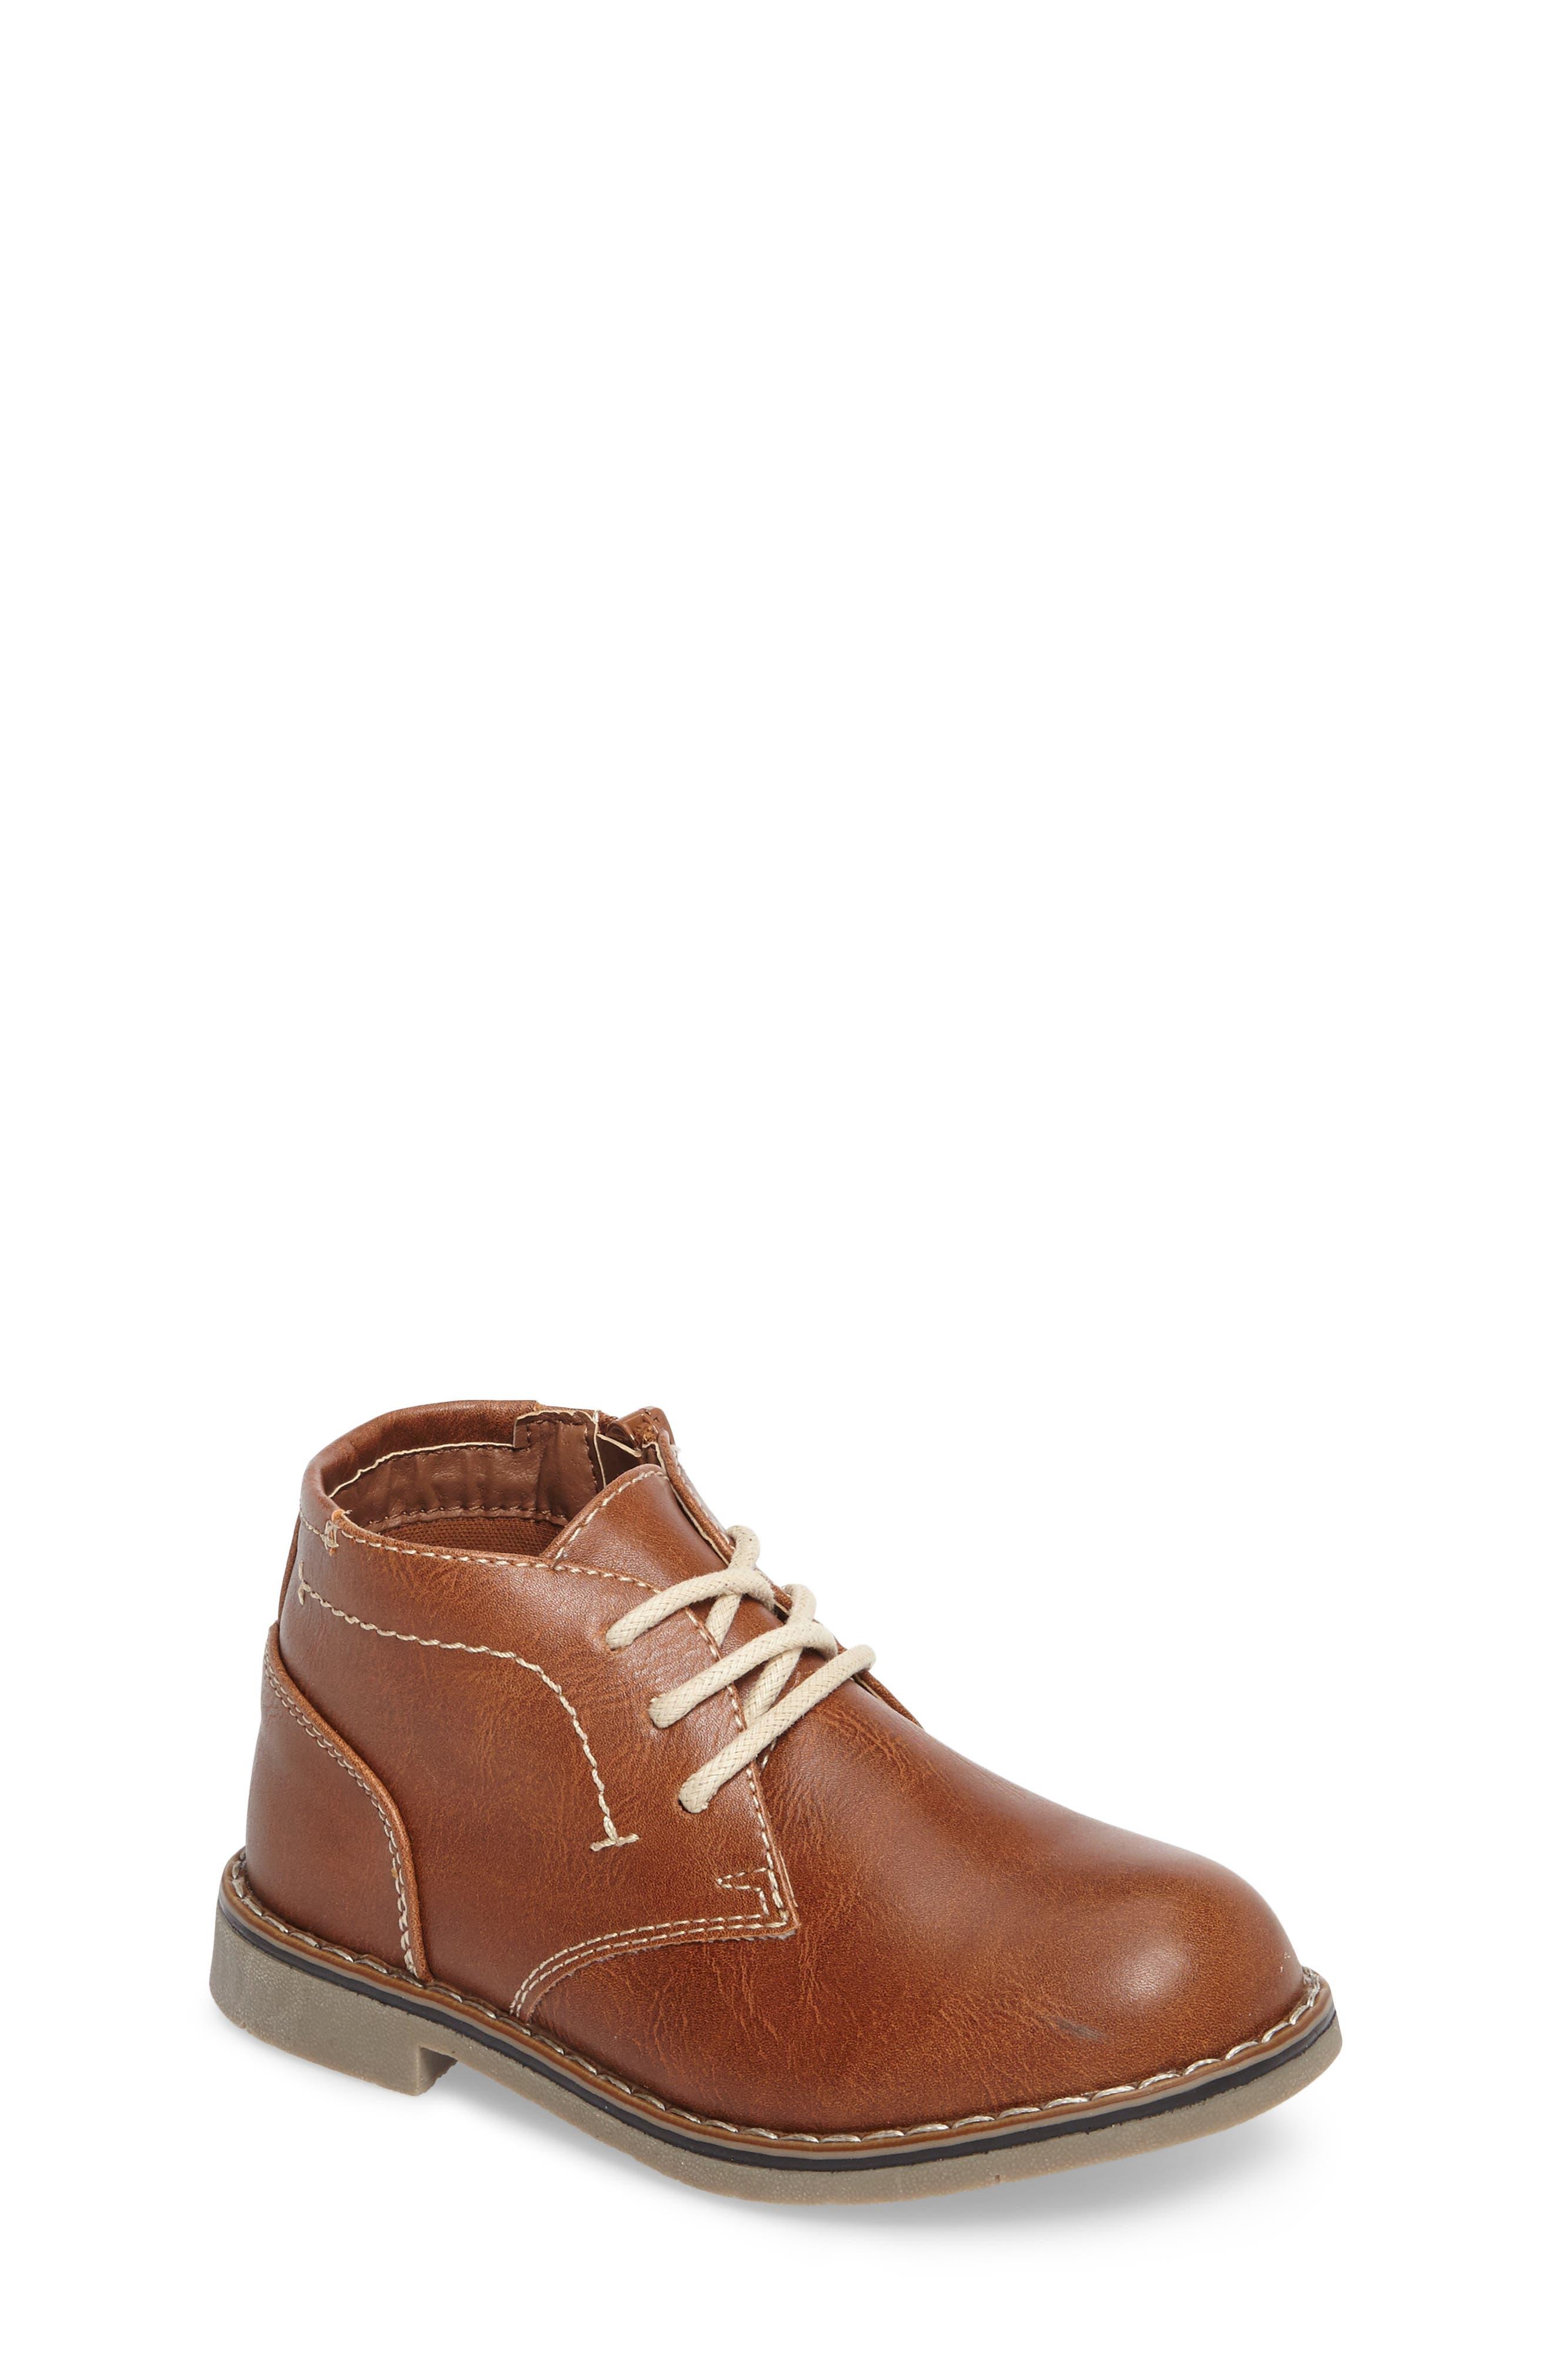 Chukka Boot,                         Main,                         color, 208